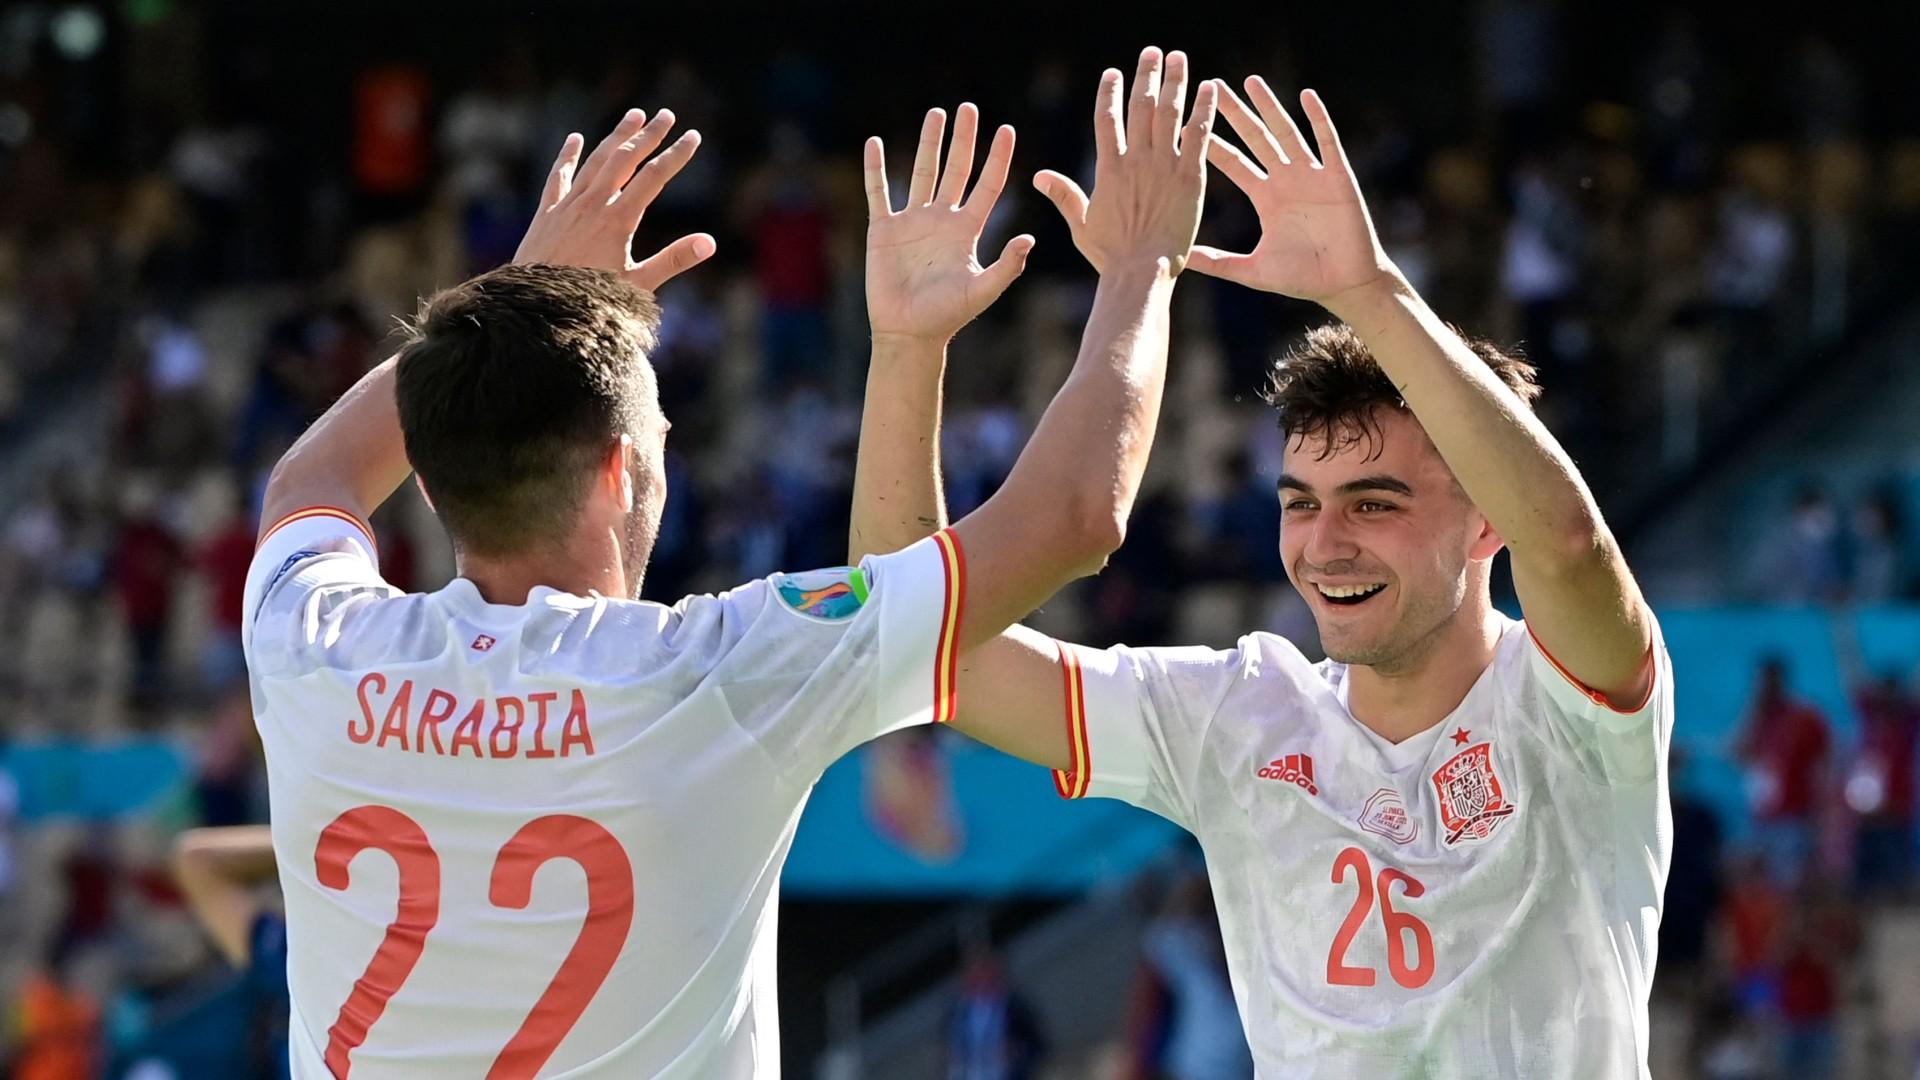 LIVE: Switzerland vs Spain